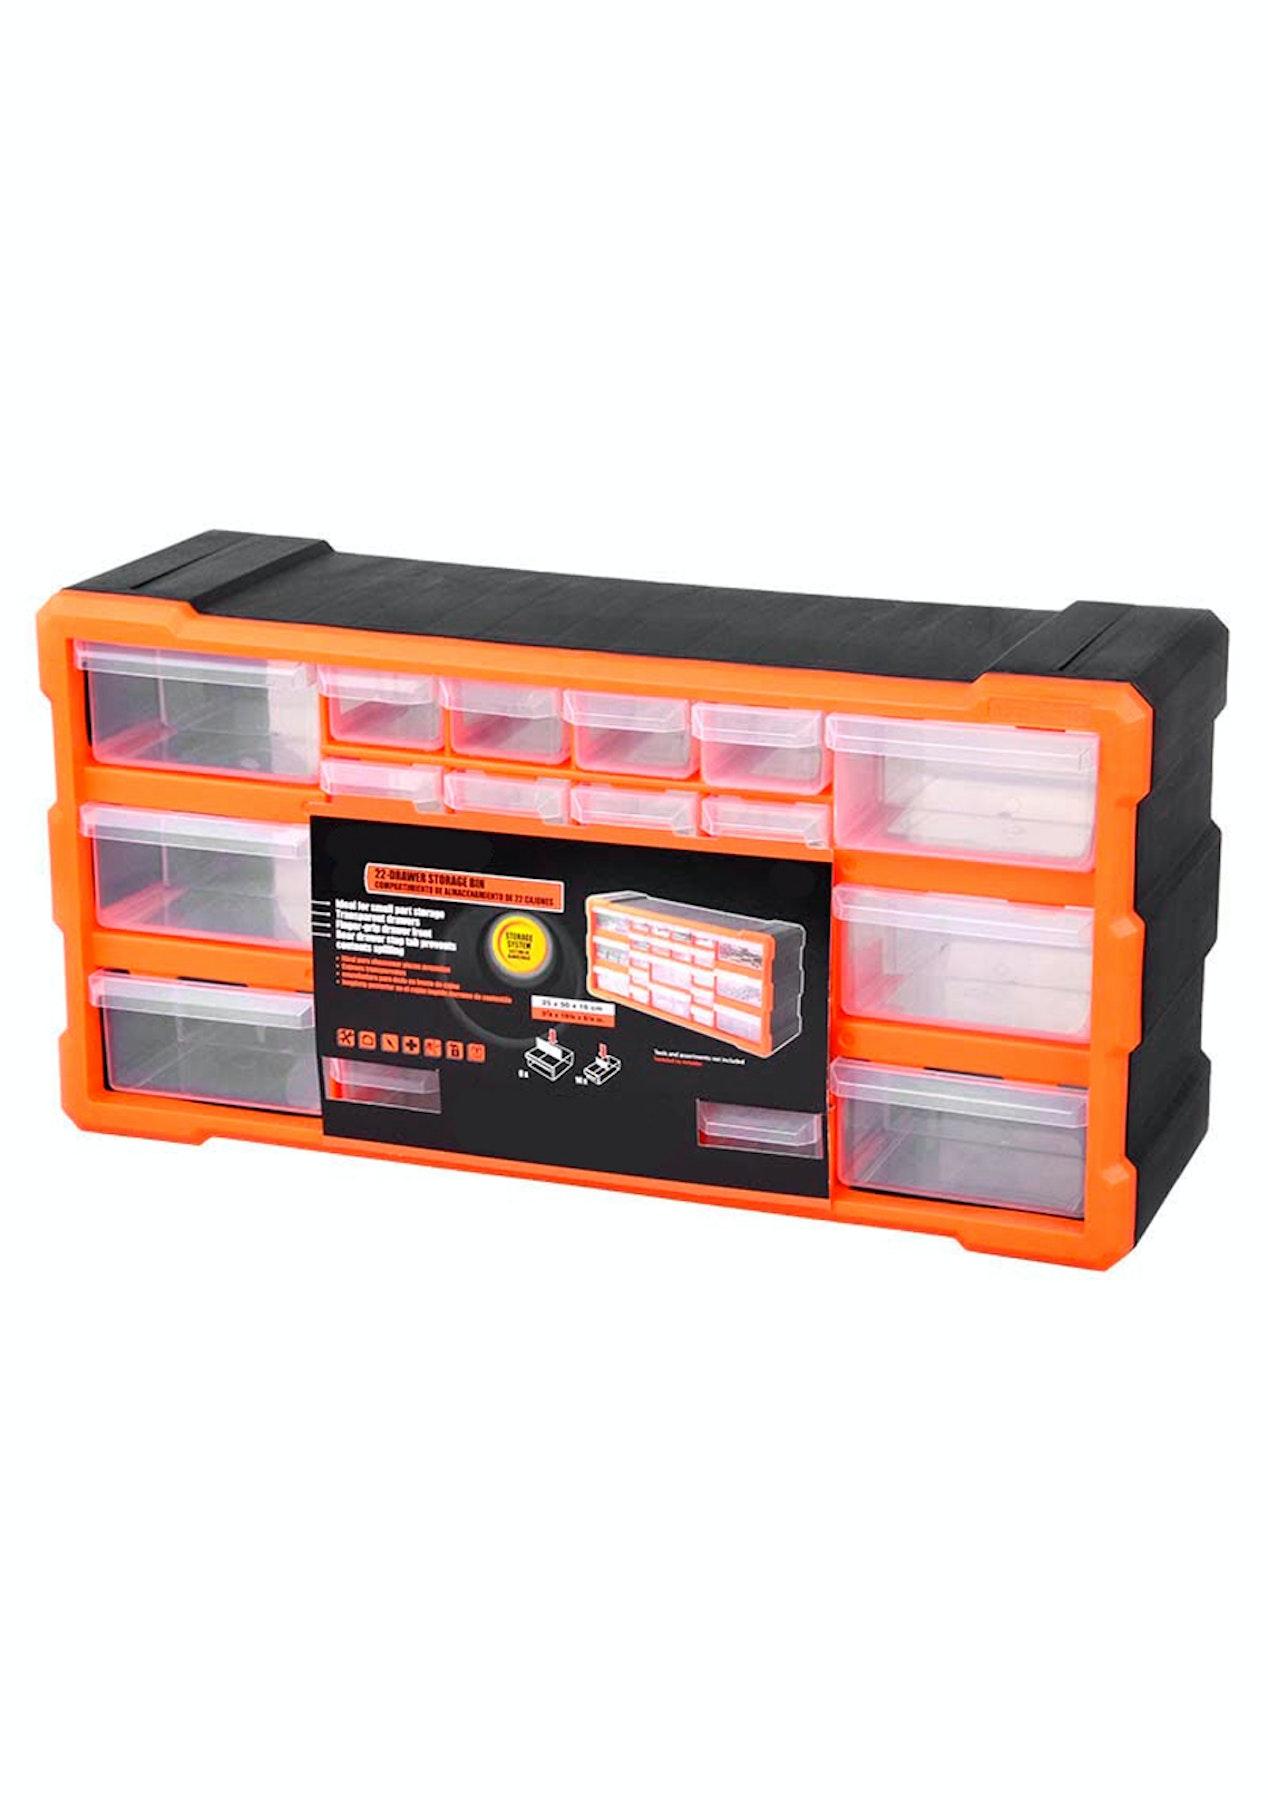 22 Drawer Plastic Parts Organizer Storage Box